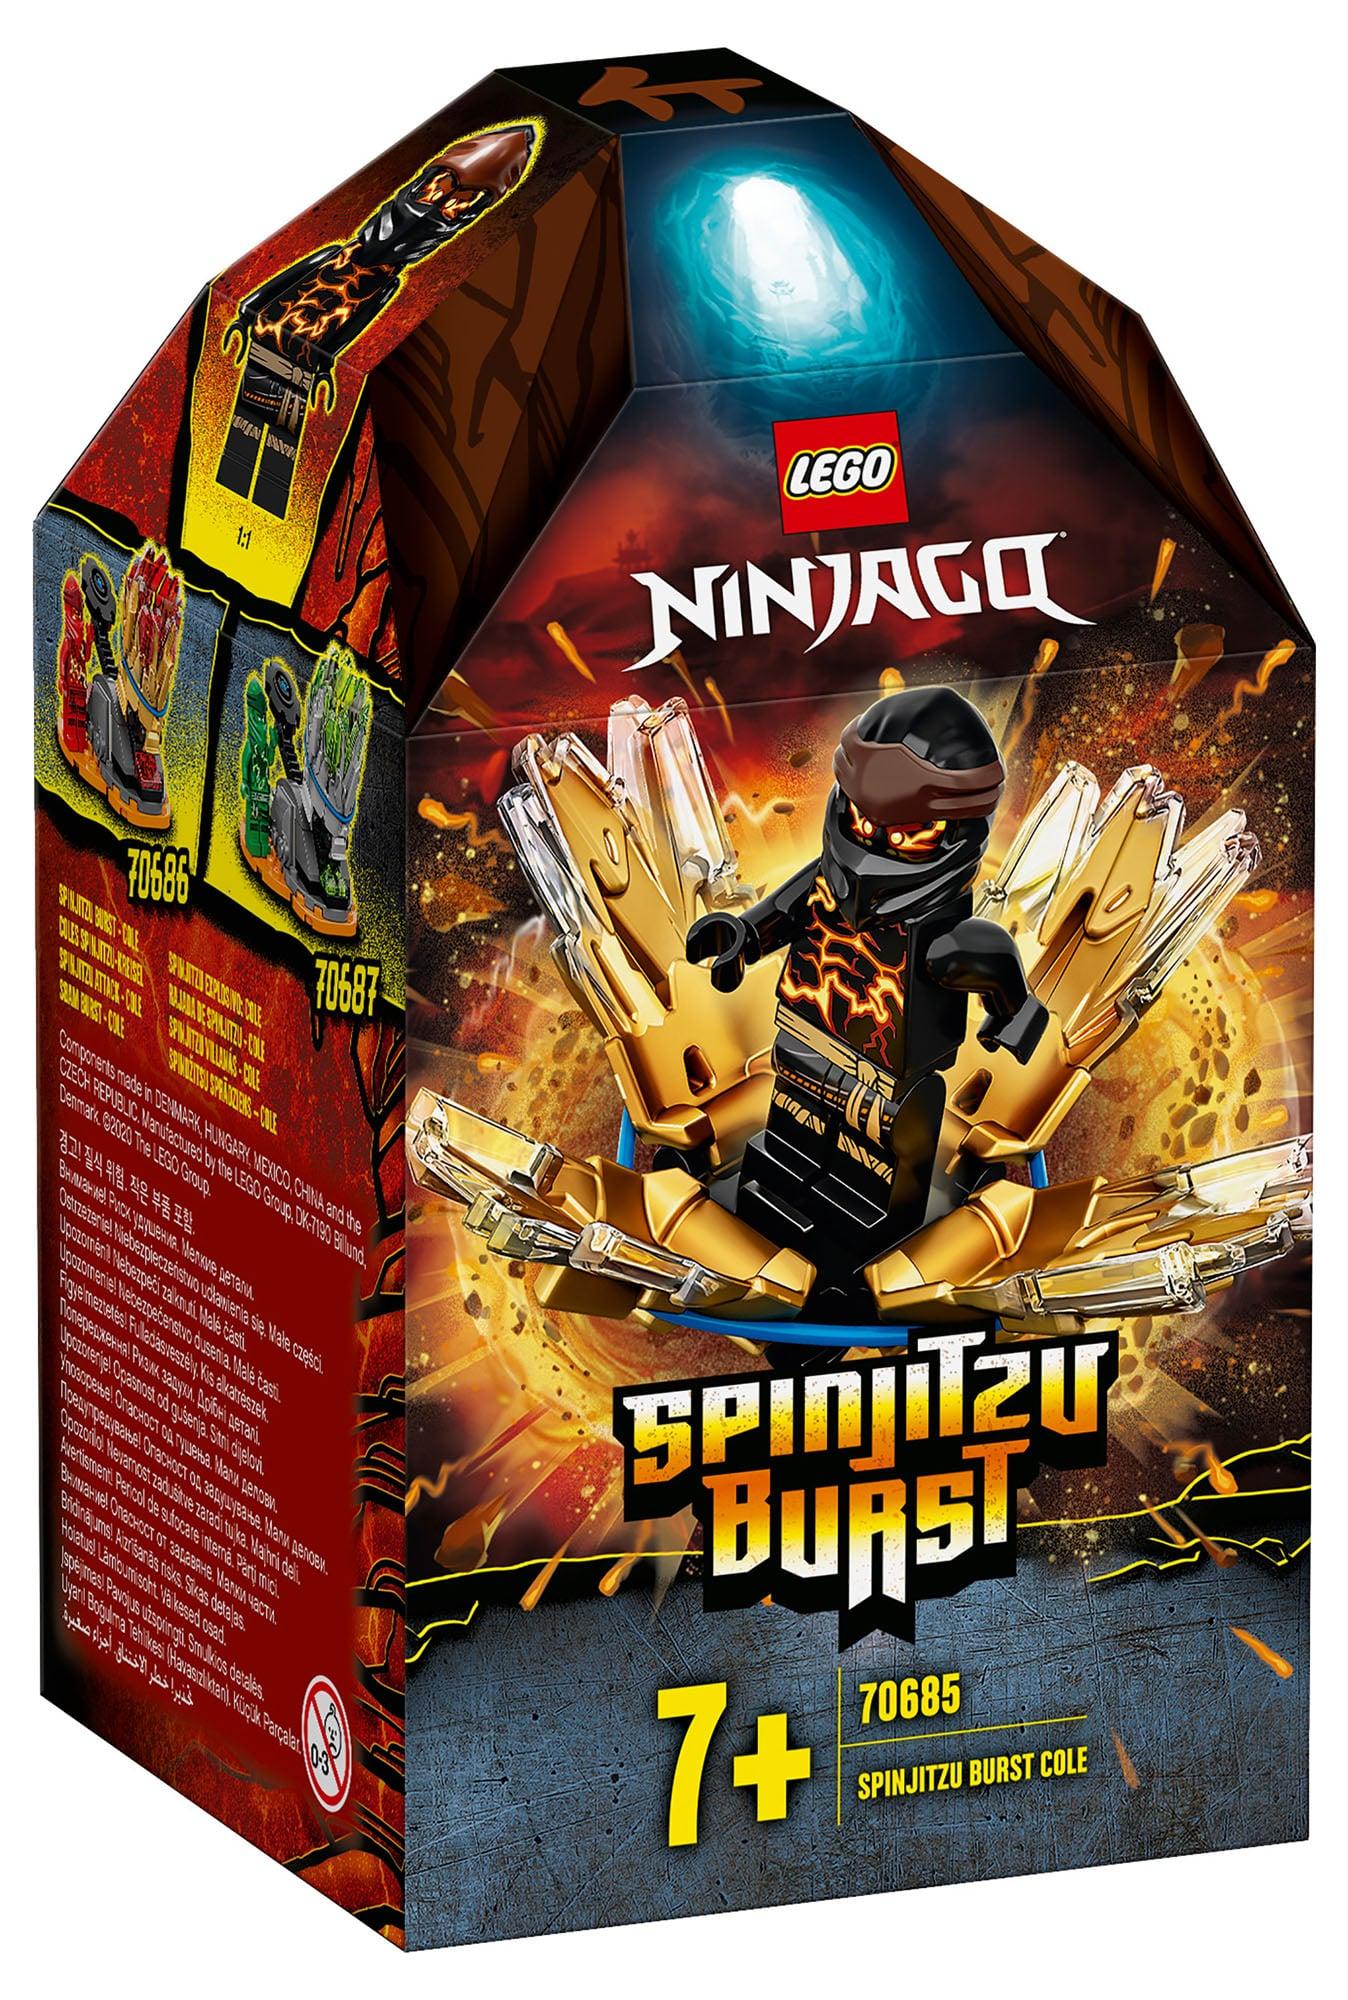 LEGO Ninjago 70685 Coles Spinjitzu Burst